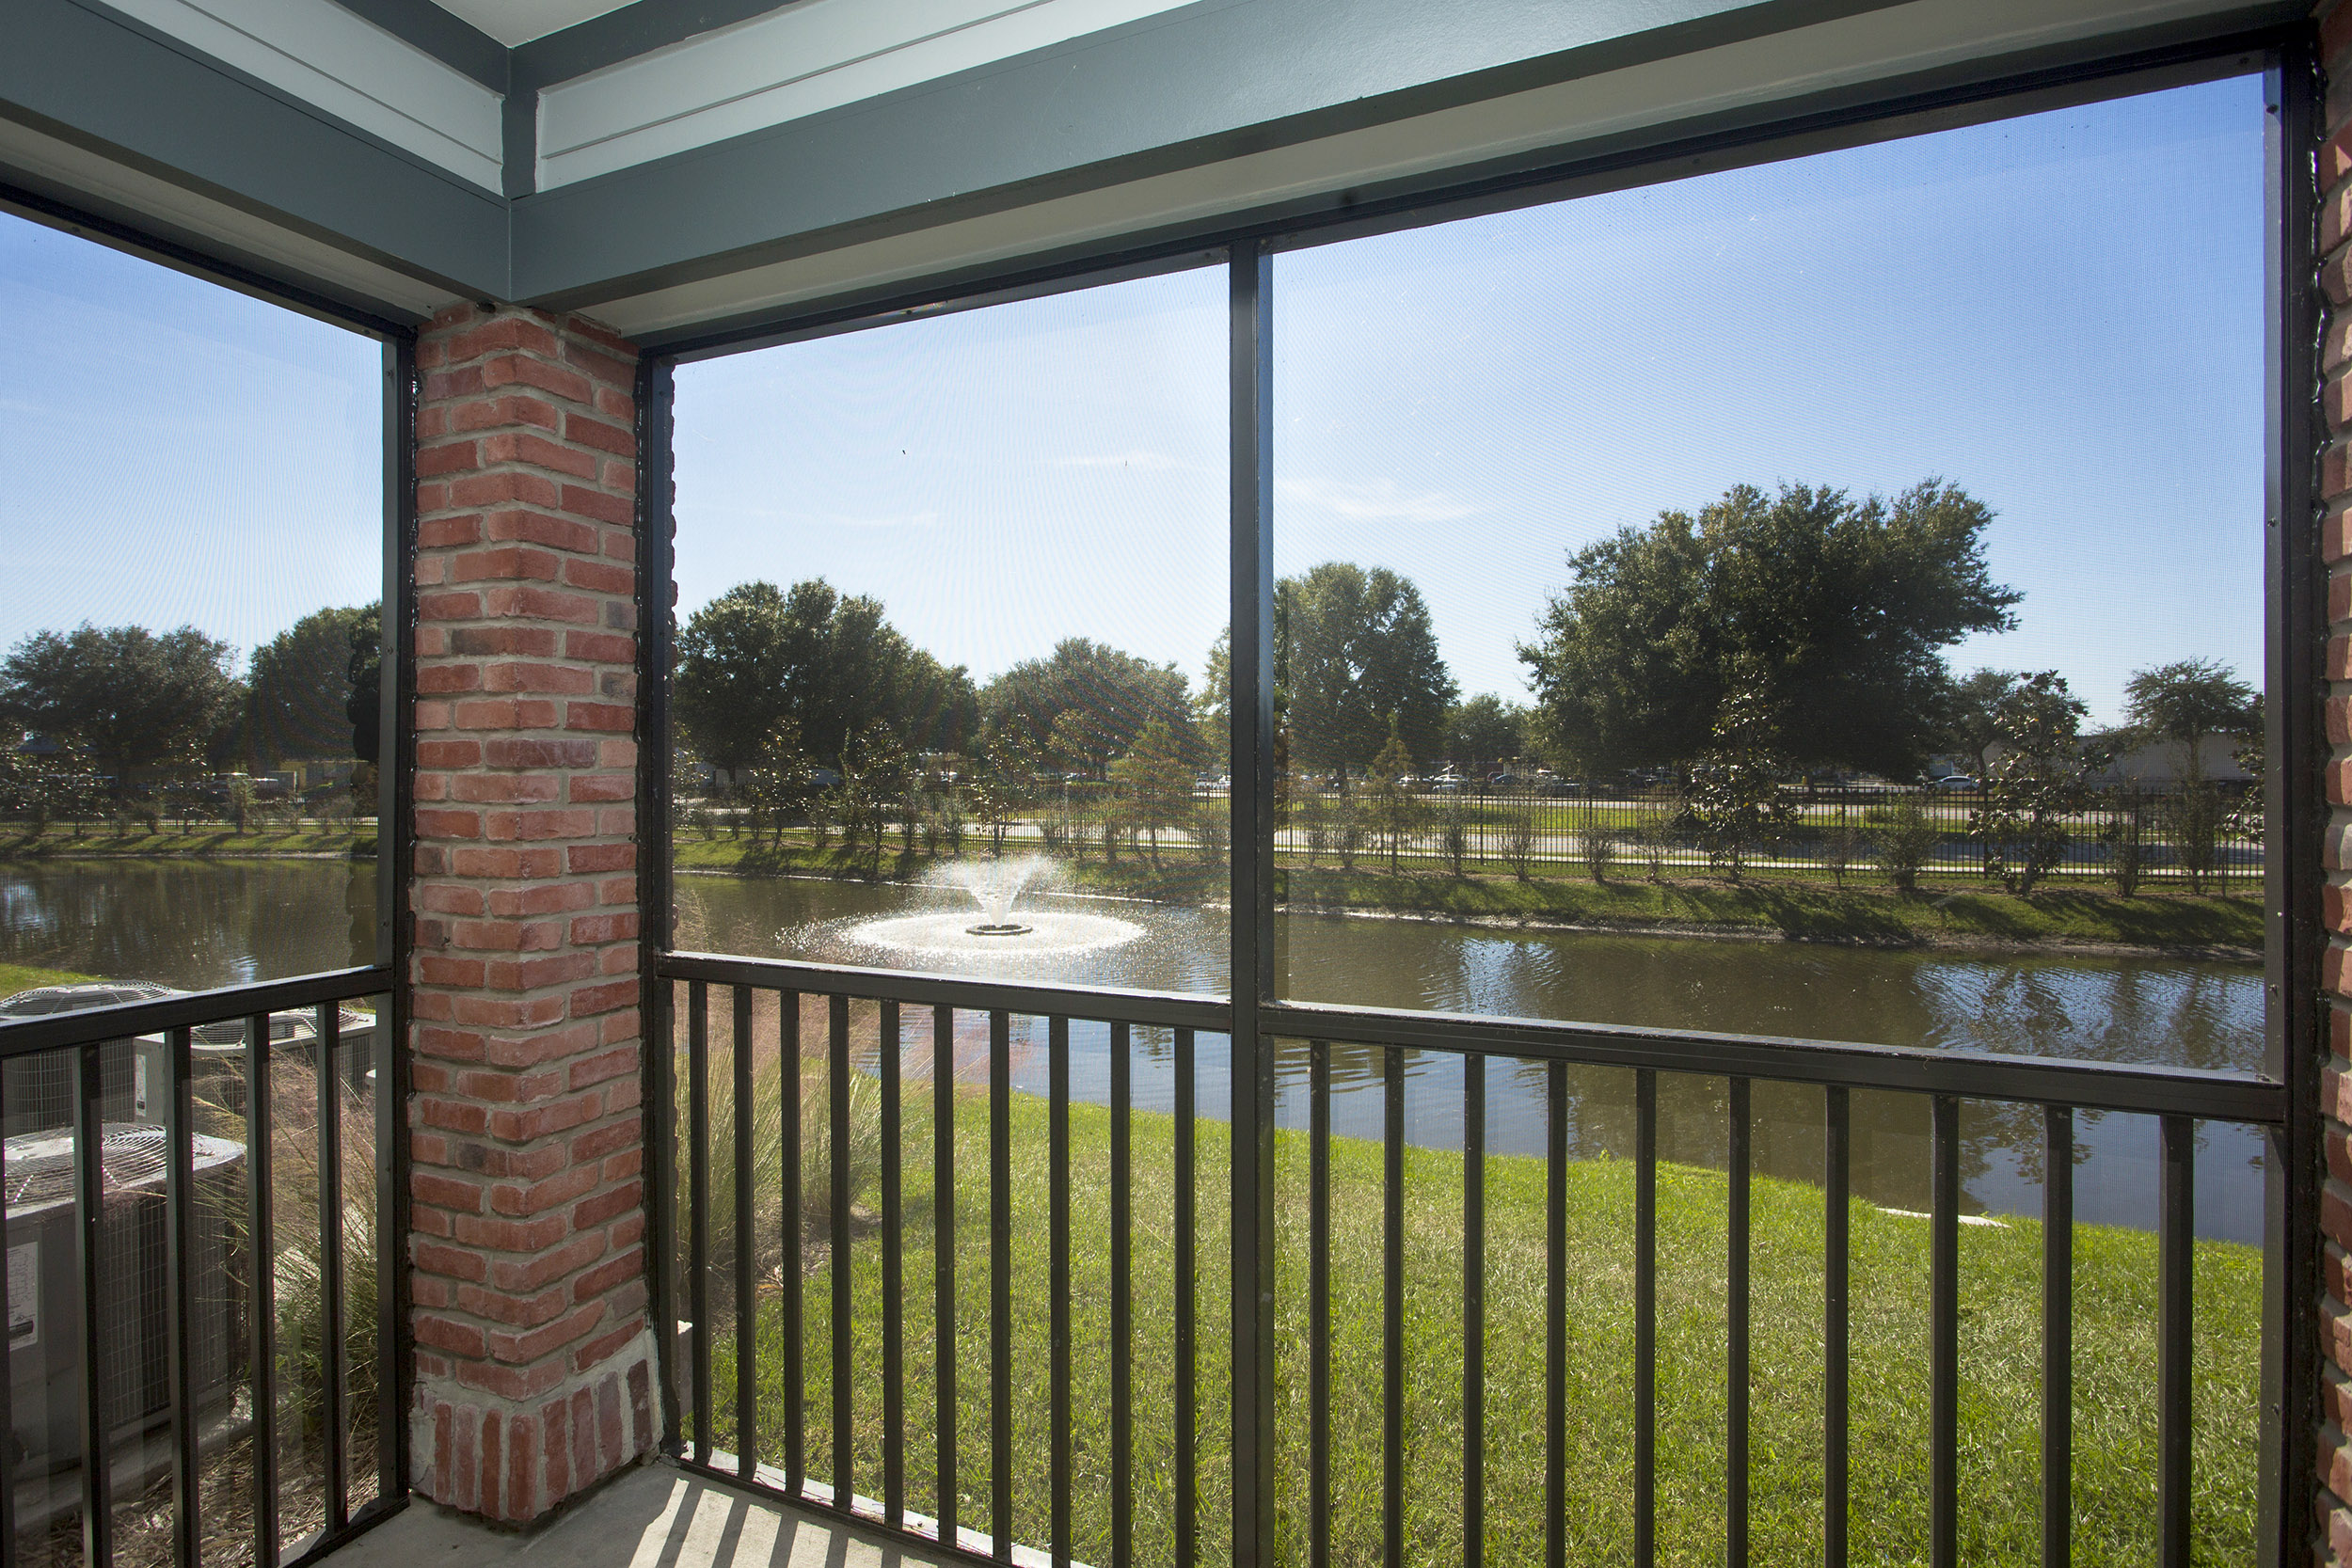 CharlestonEdge-Rental-Apartment-Brandon-Tampa-Florida-Pool-Bedrooms-View.jpg